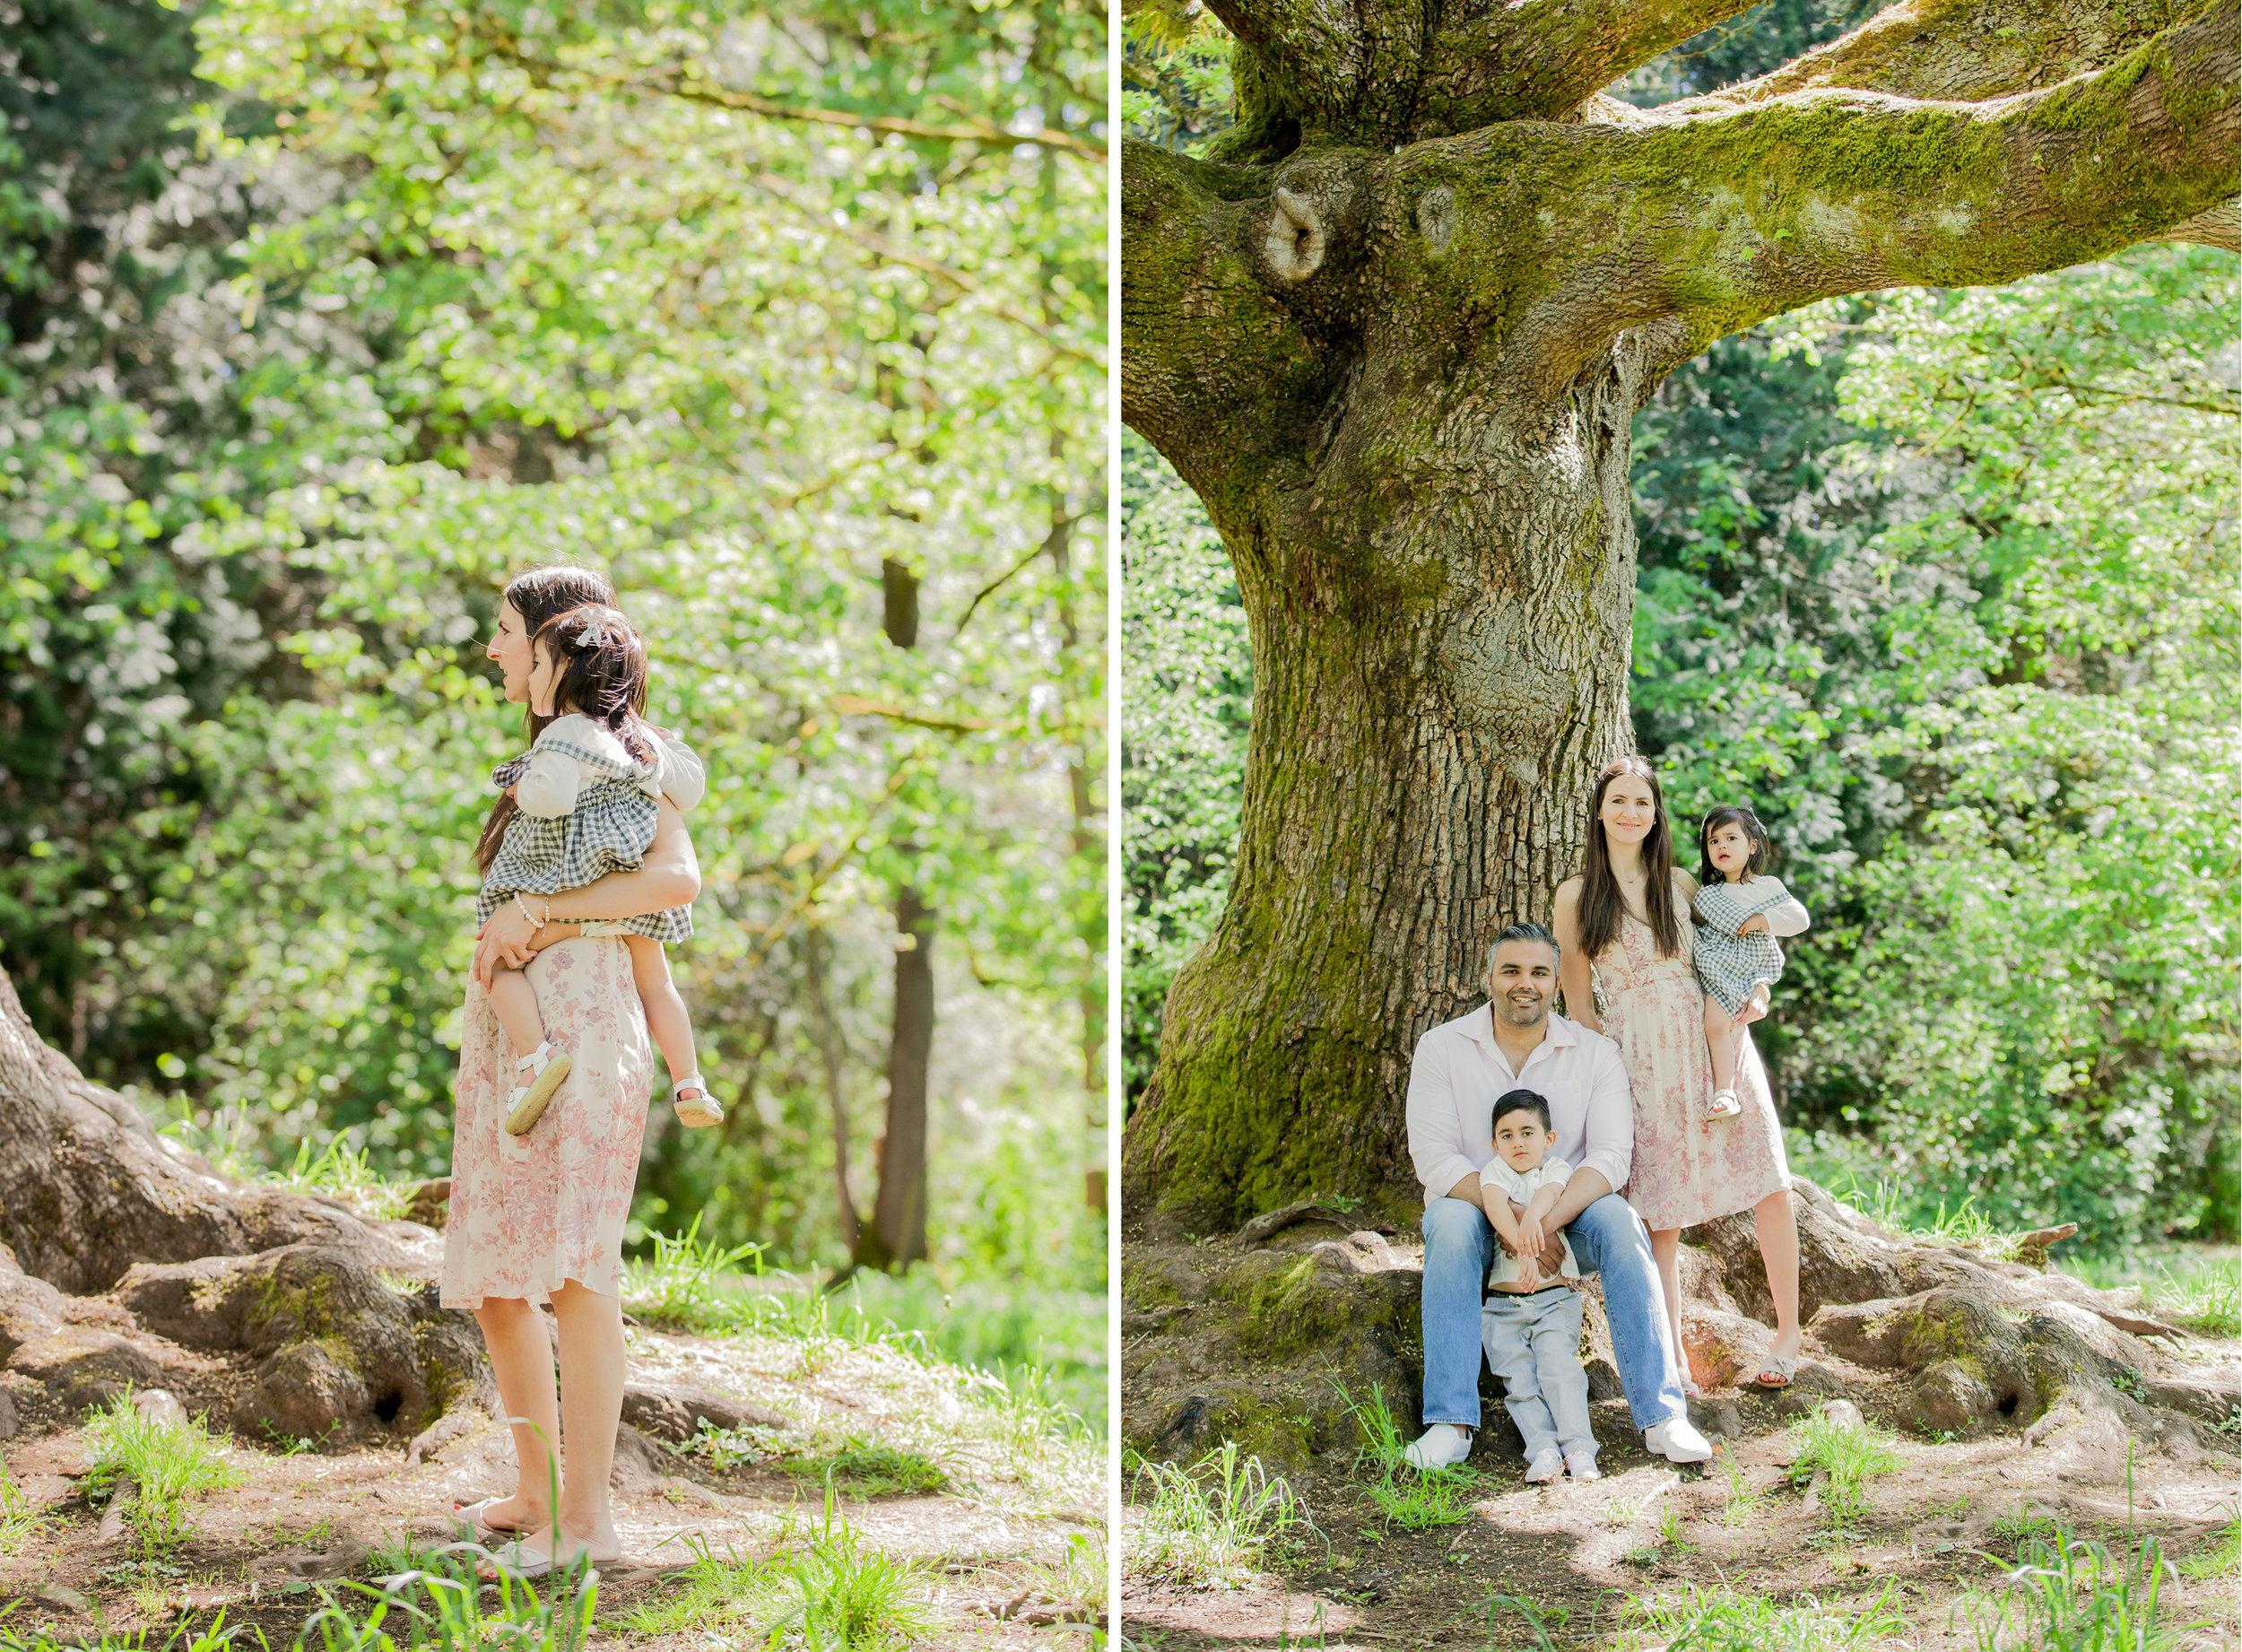 Redwood Park - May 2018 - WT (32 of 175).jpg